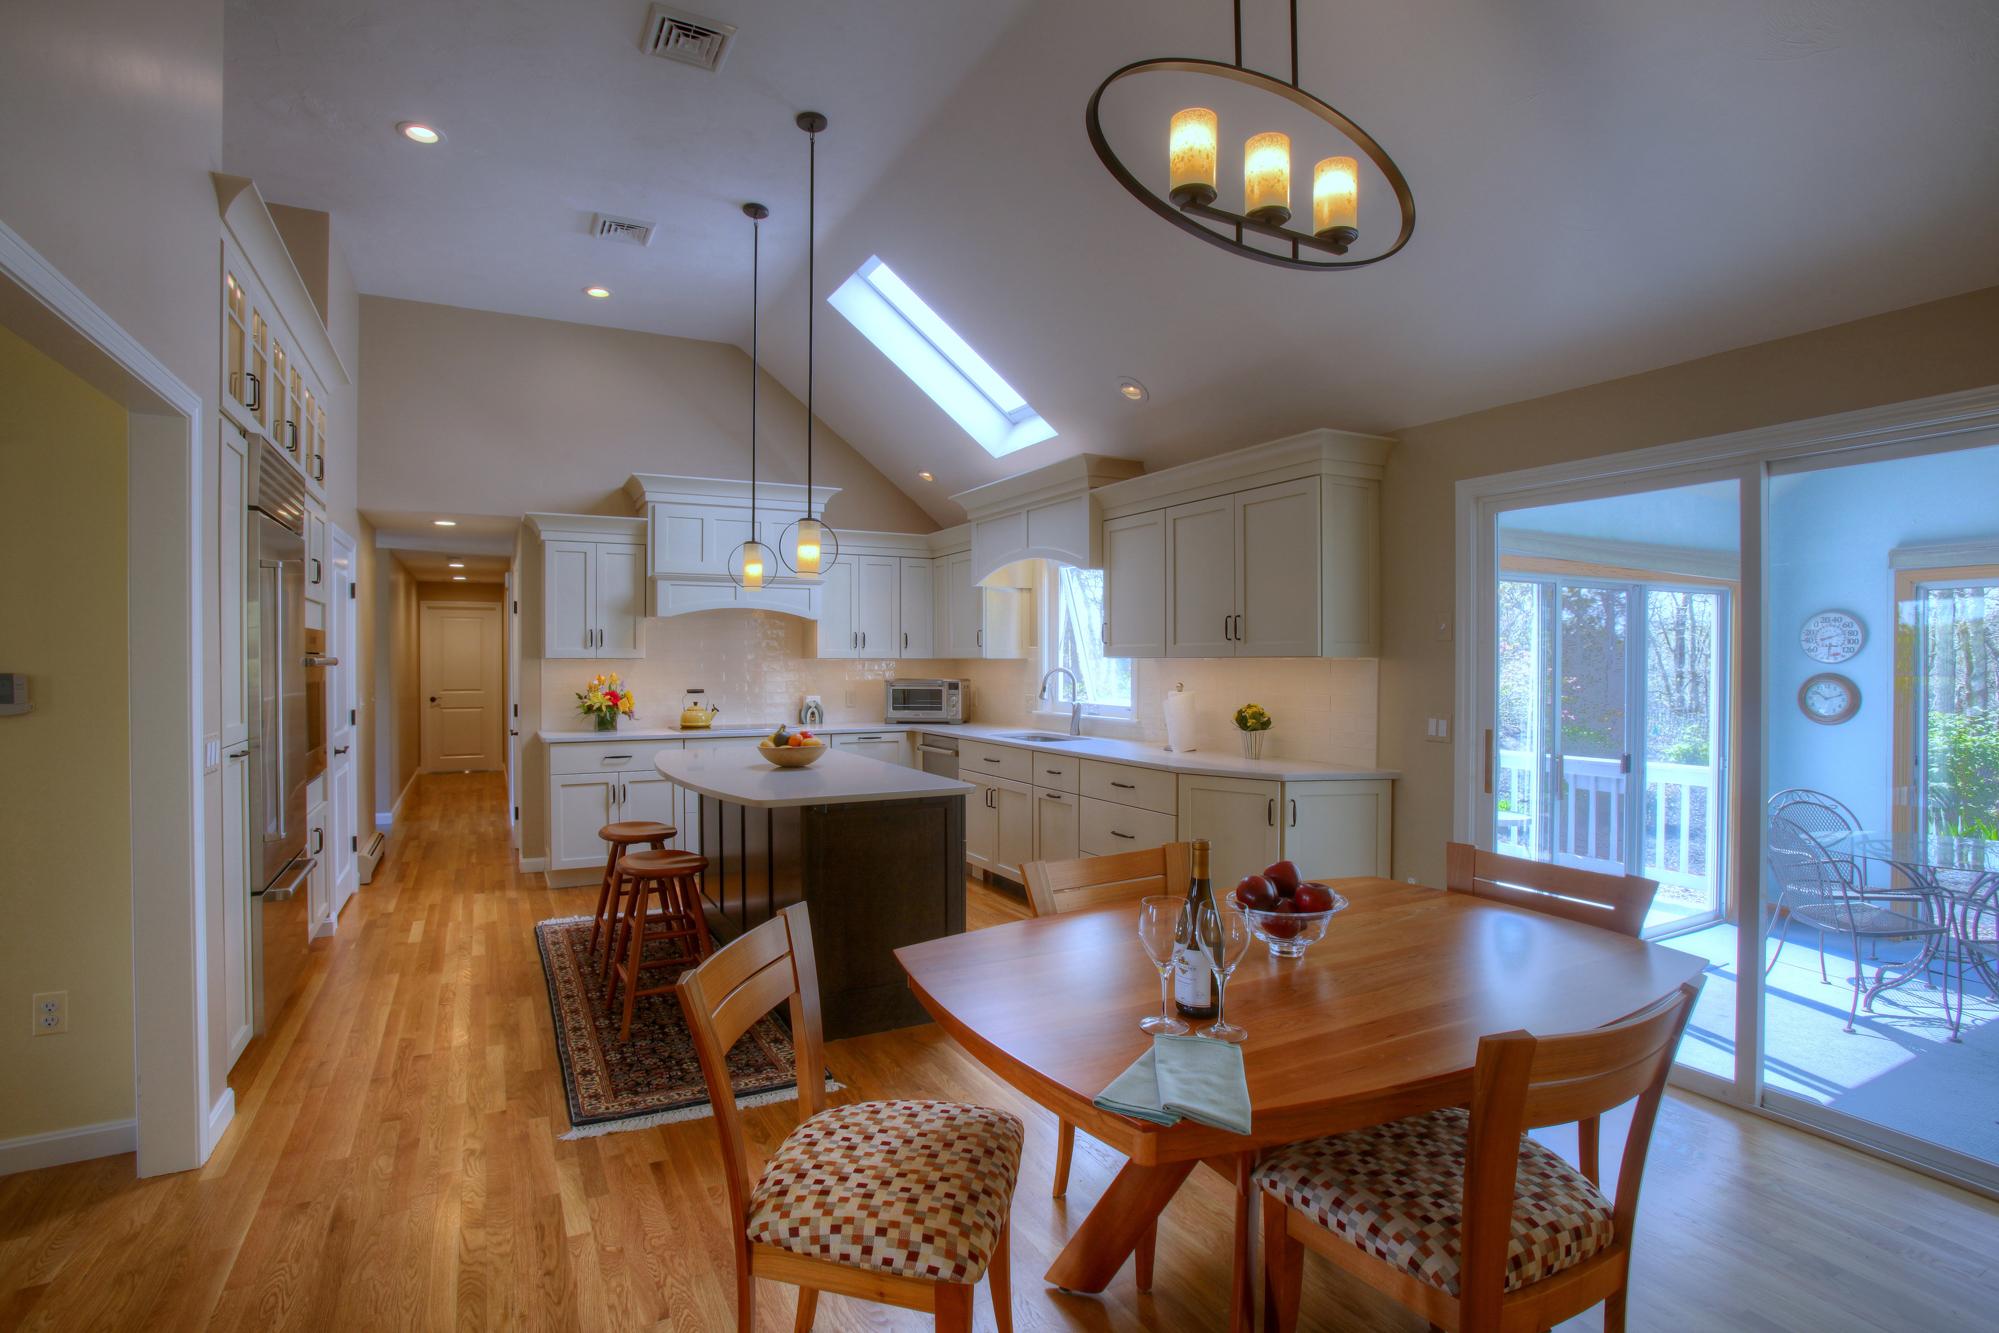 Kitchen Lighting Design Jlc Online Lights Single Switch Wiring Diagram